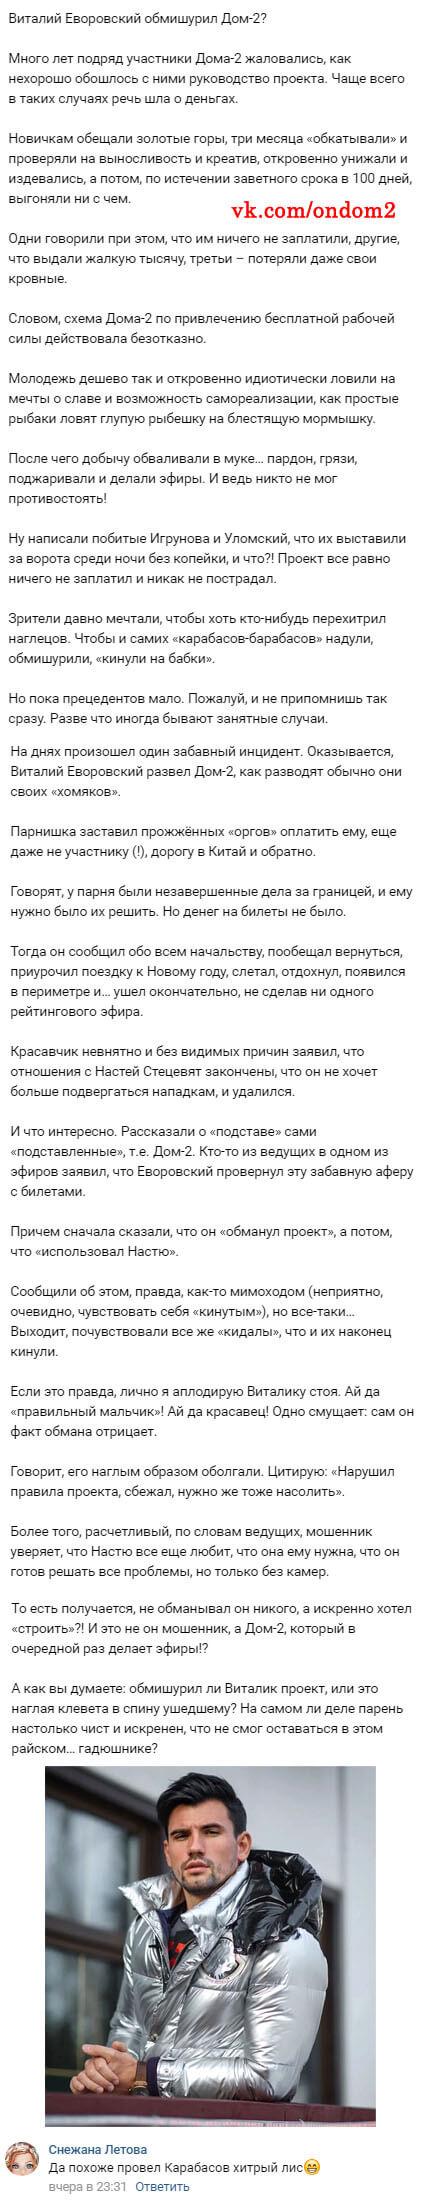 Слухи про Виталия Еворовского вконтакте